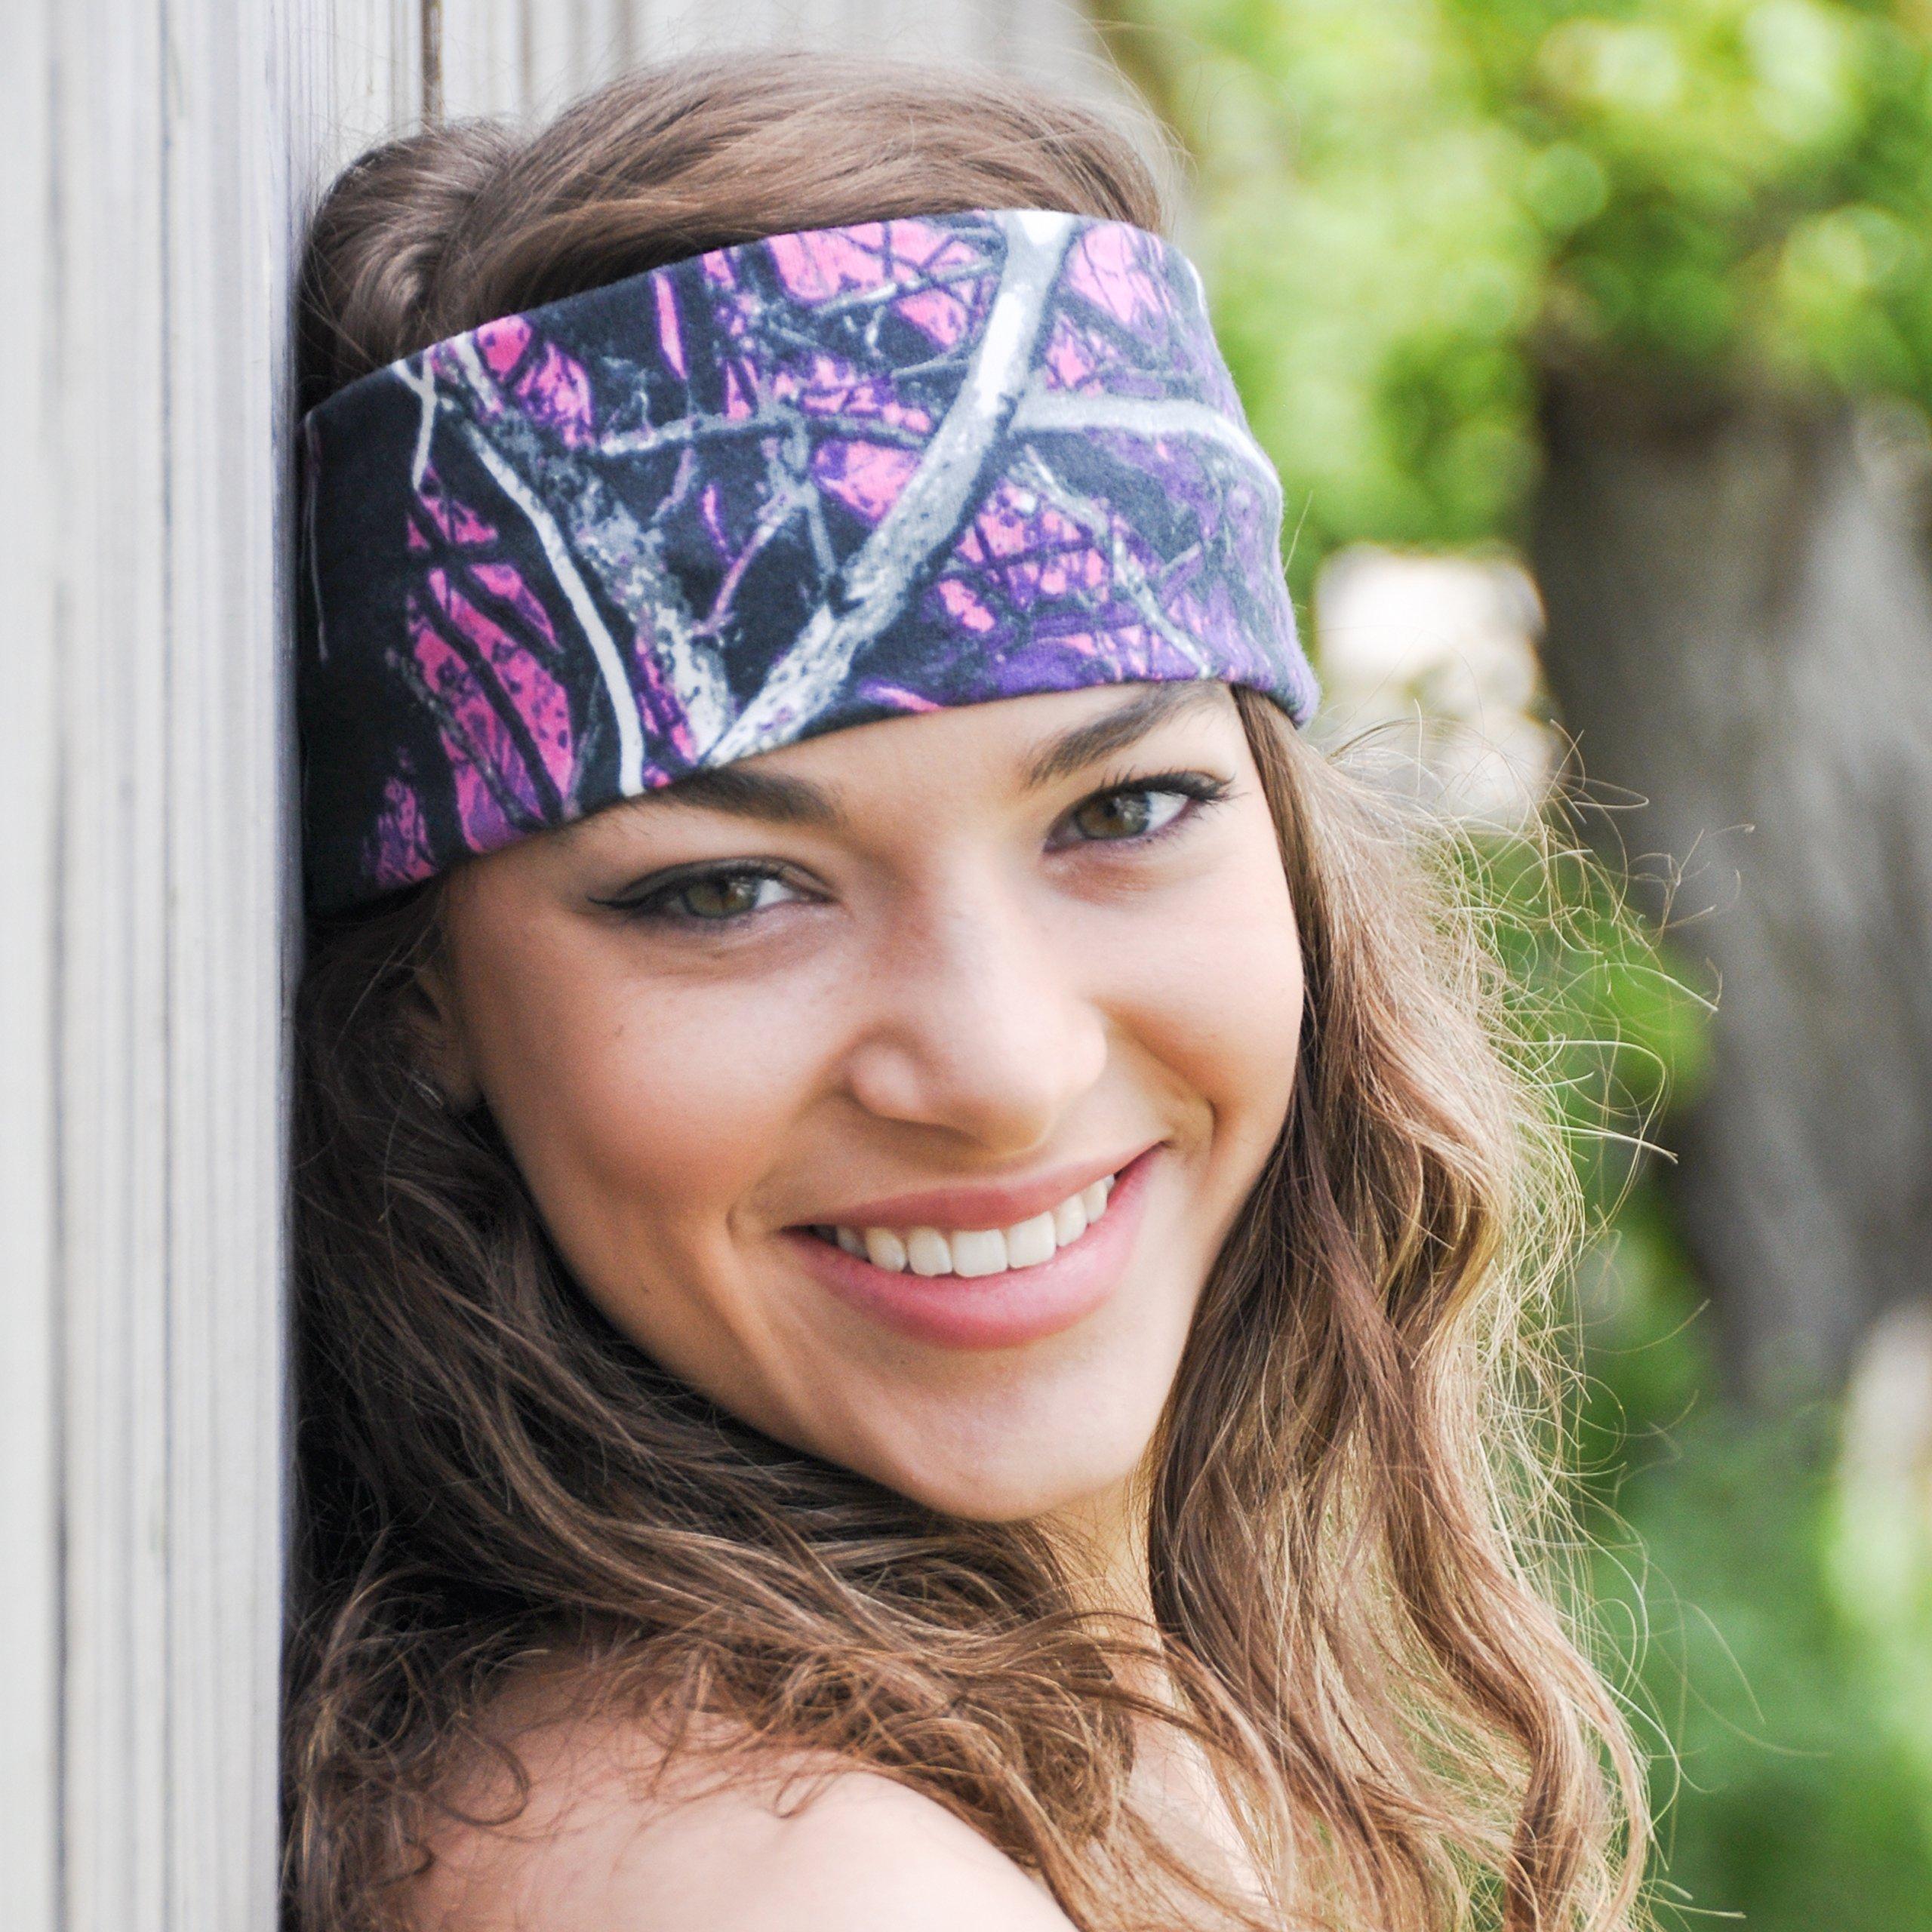 Muddy Girl Camo Fabric Headband by Reindeer Country